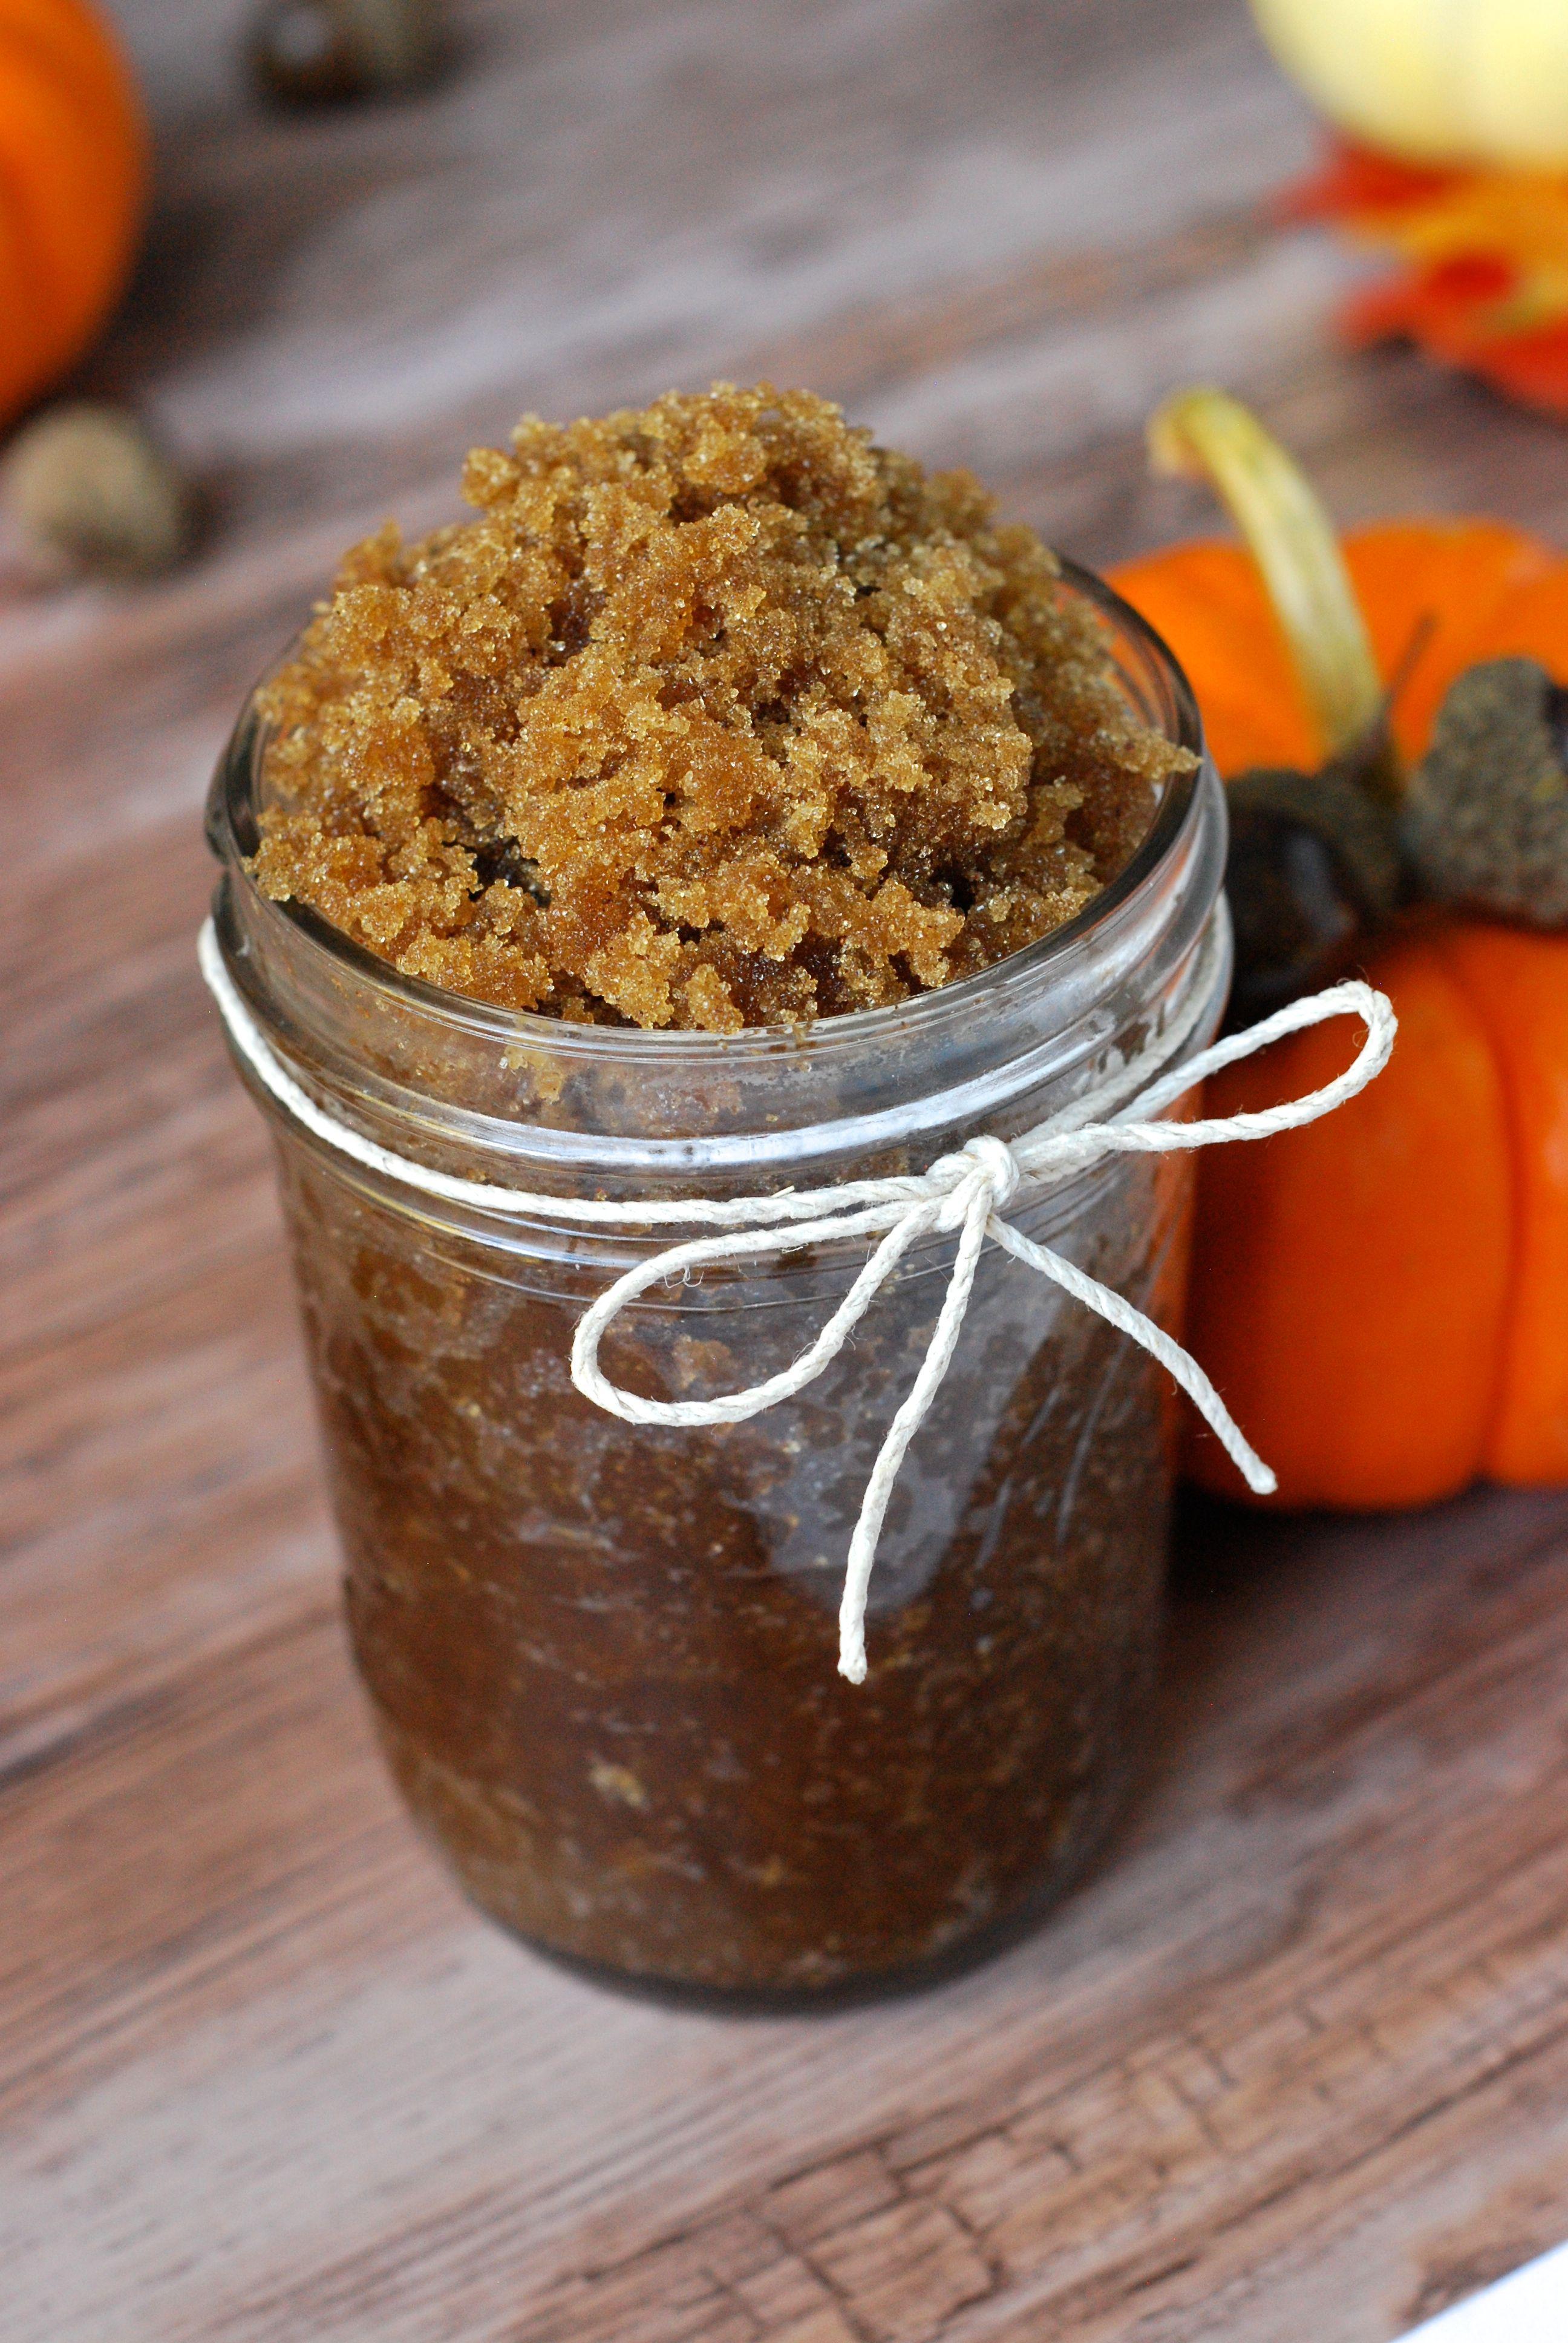 How_to_make_your_own_sugar_scrub pumpkin spice diy bath